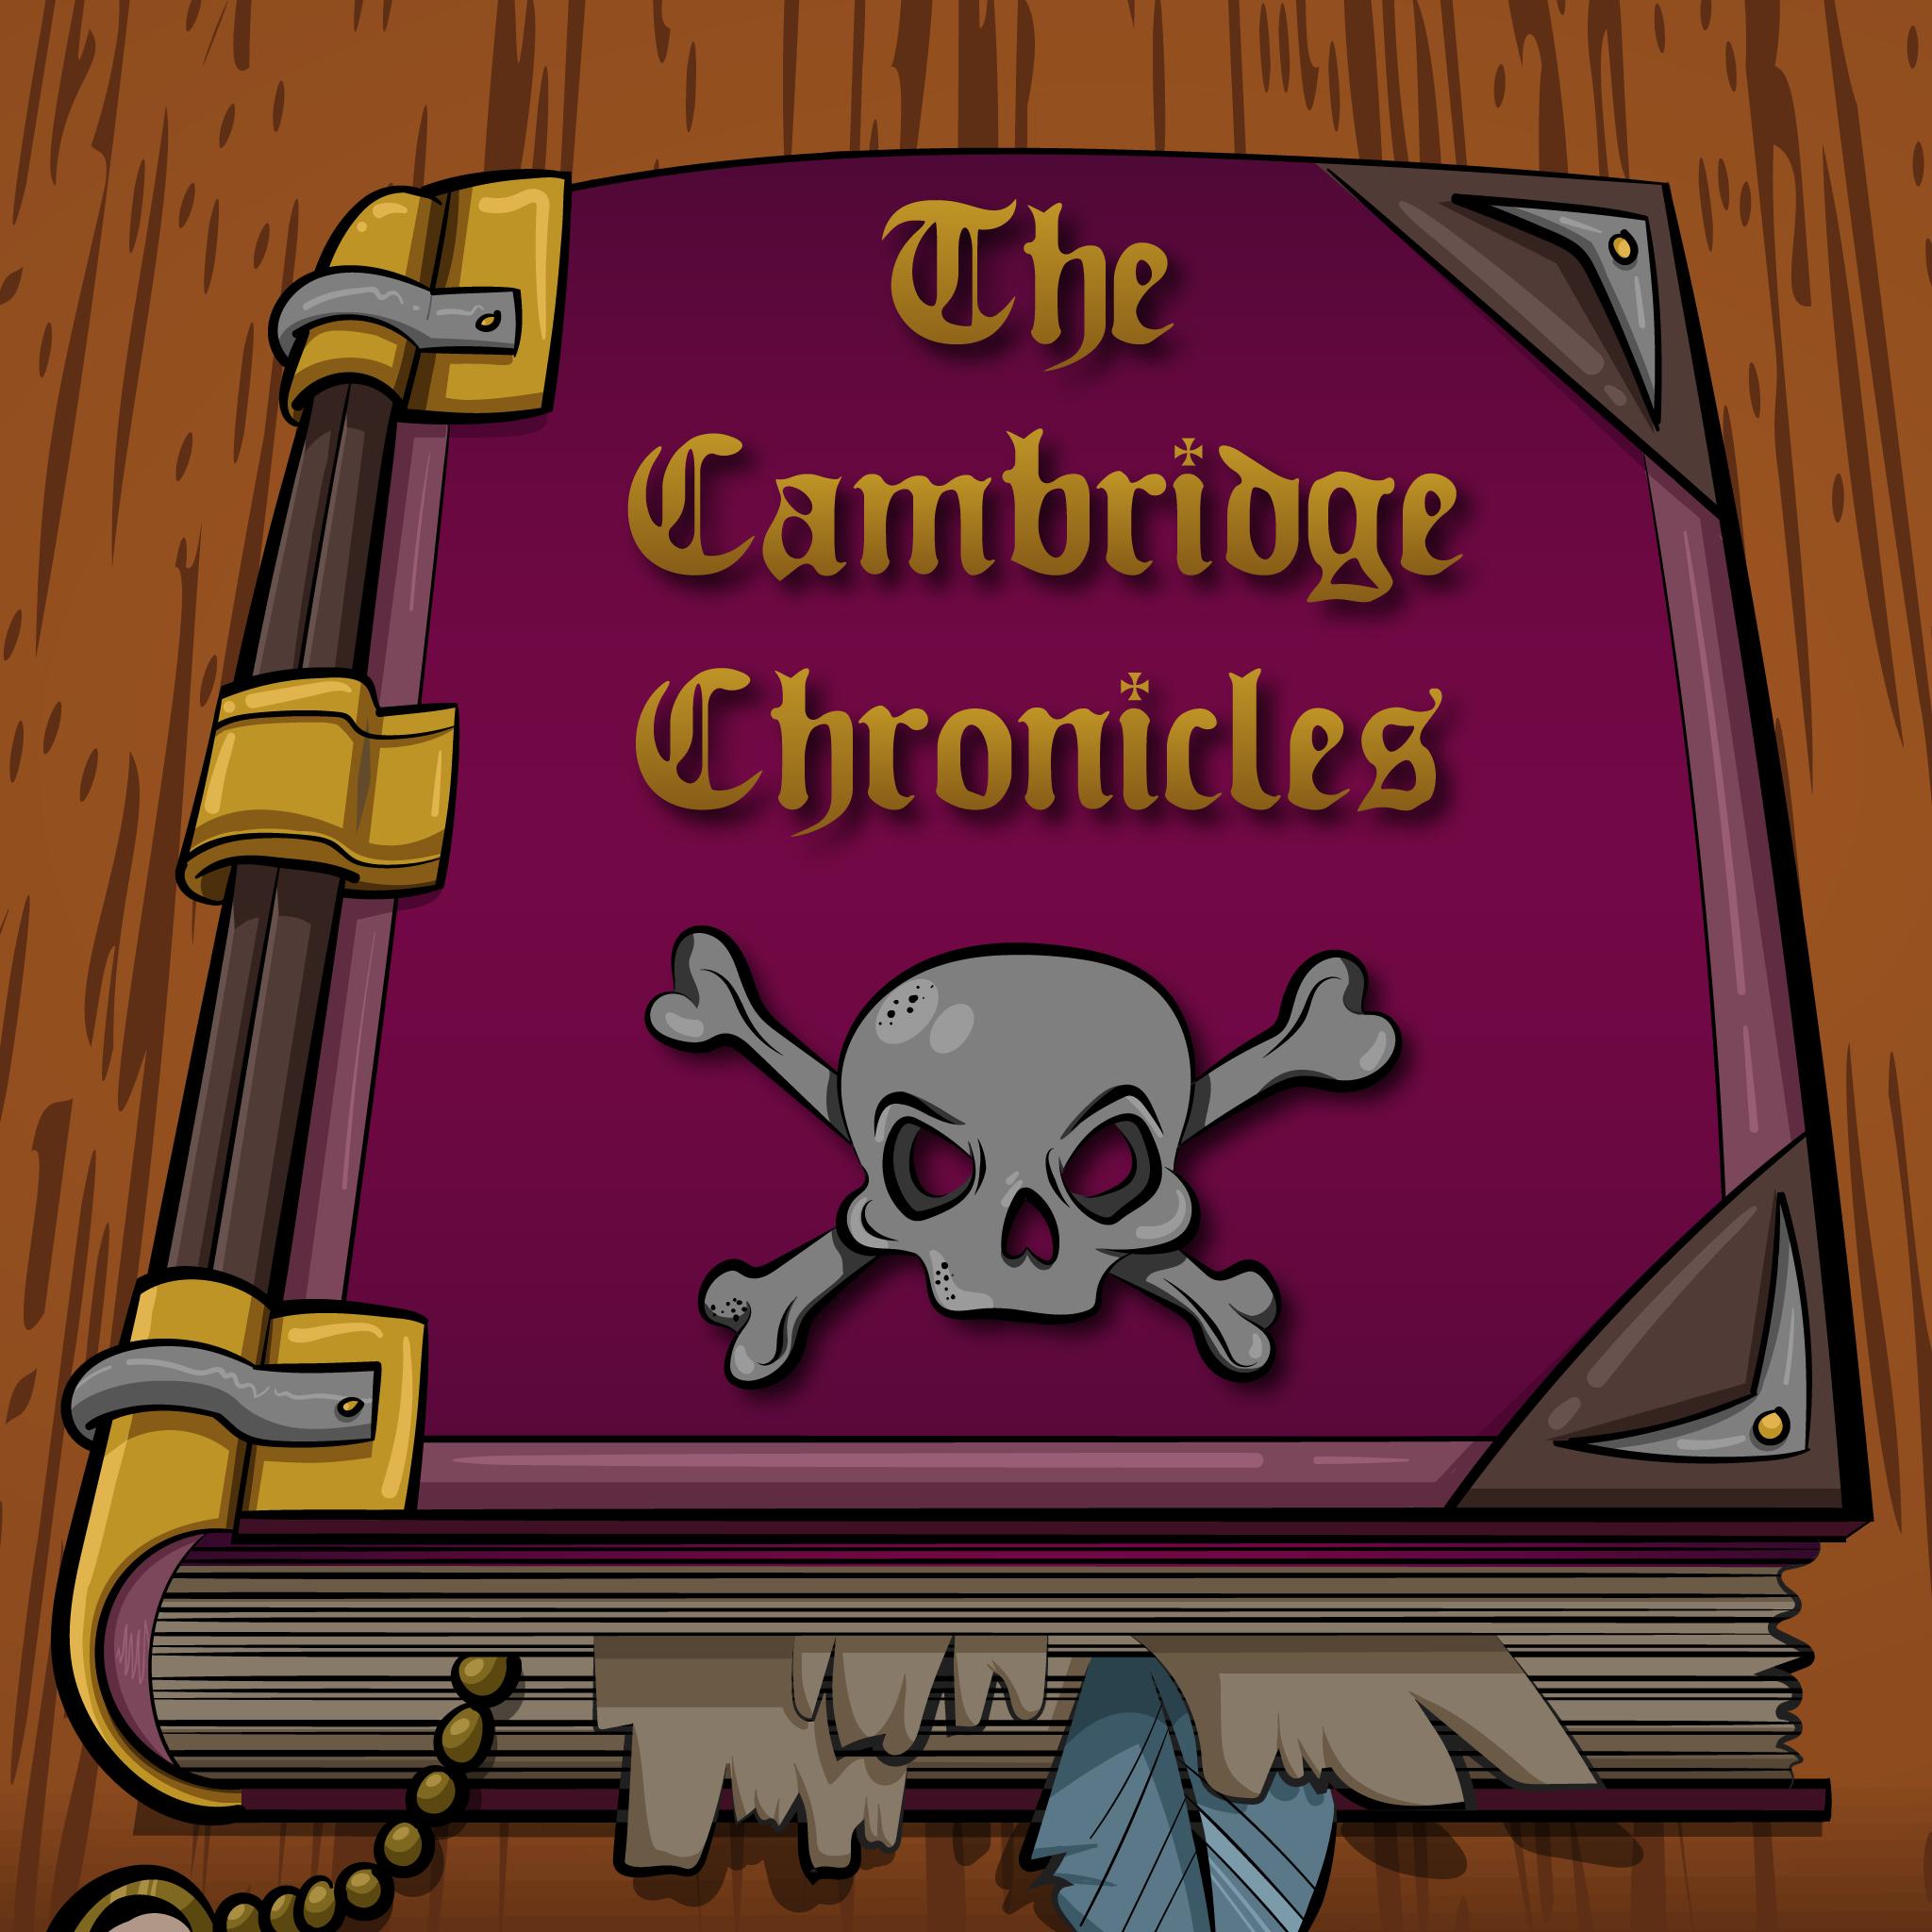 Cambridge Chronicles show art